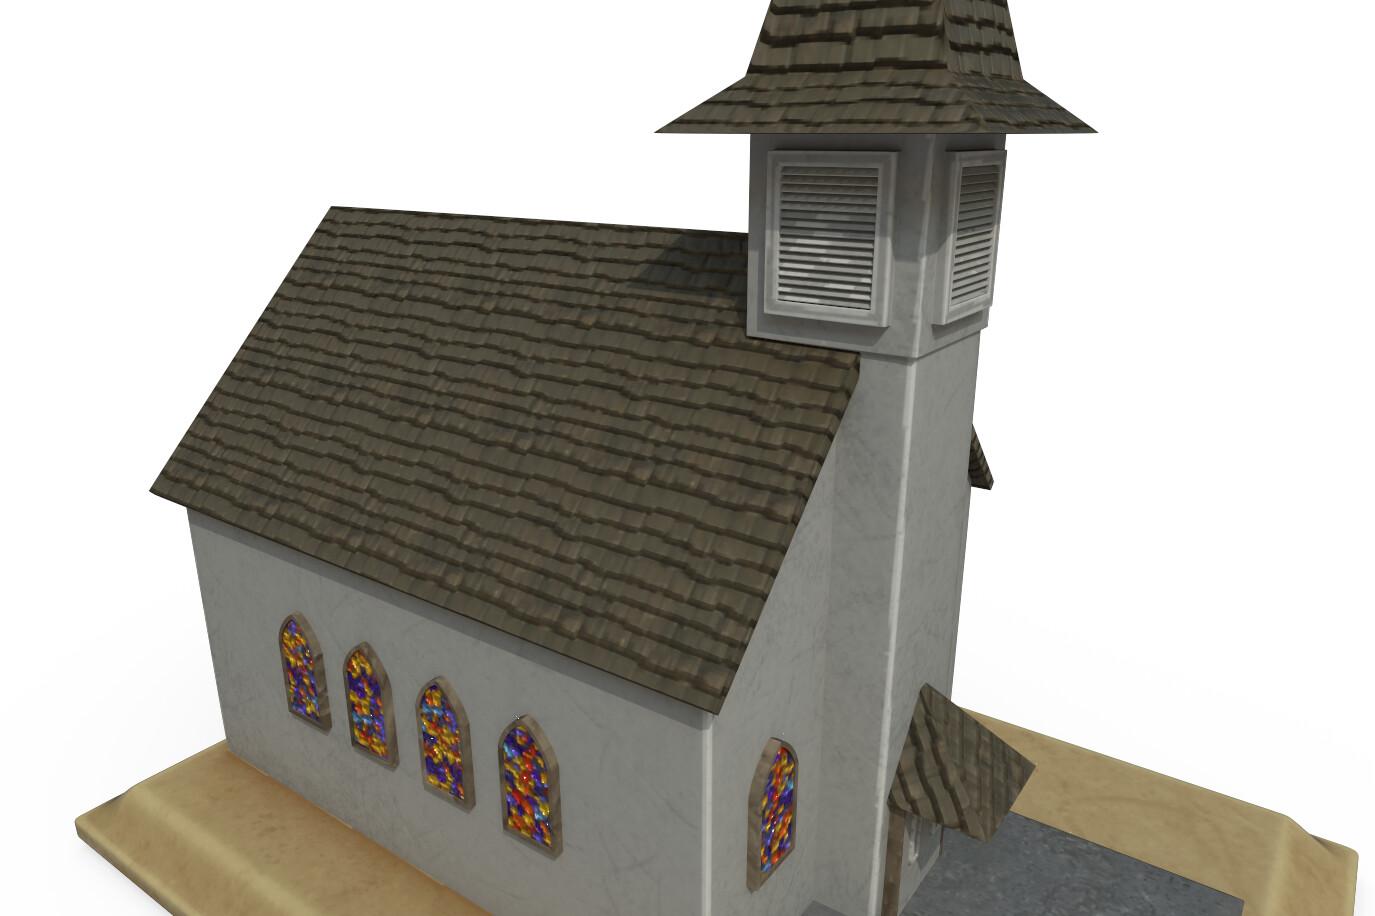 Joseph moniz church001i